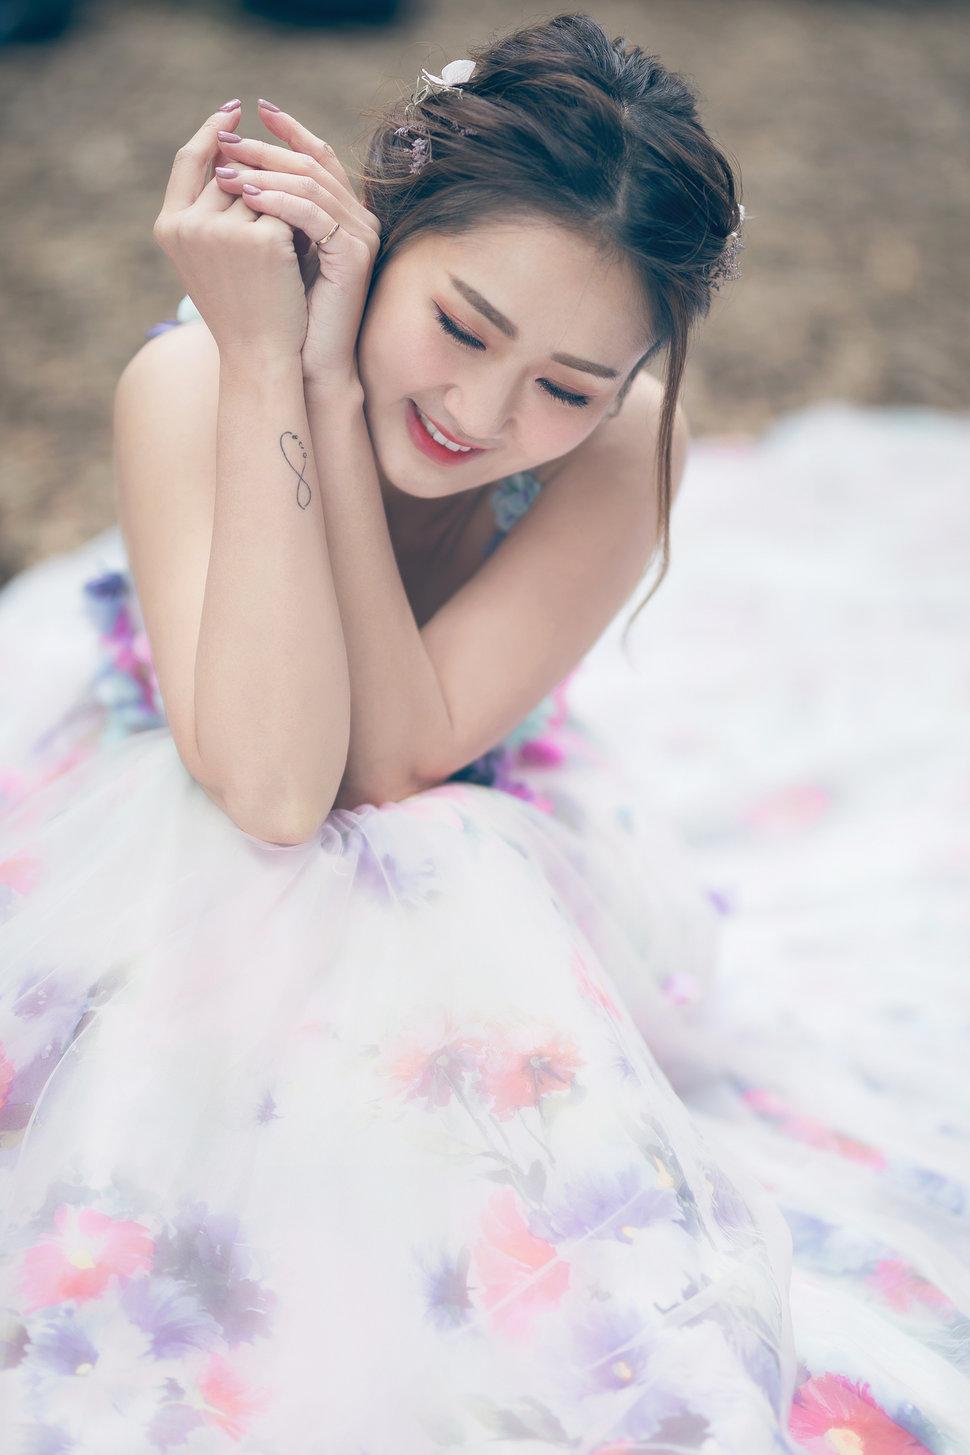 33404577188_e19da9cd4a_k - J Photographer《結婚吧》